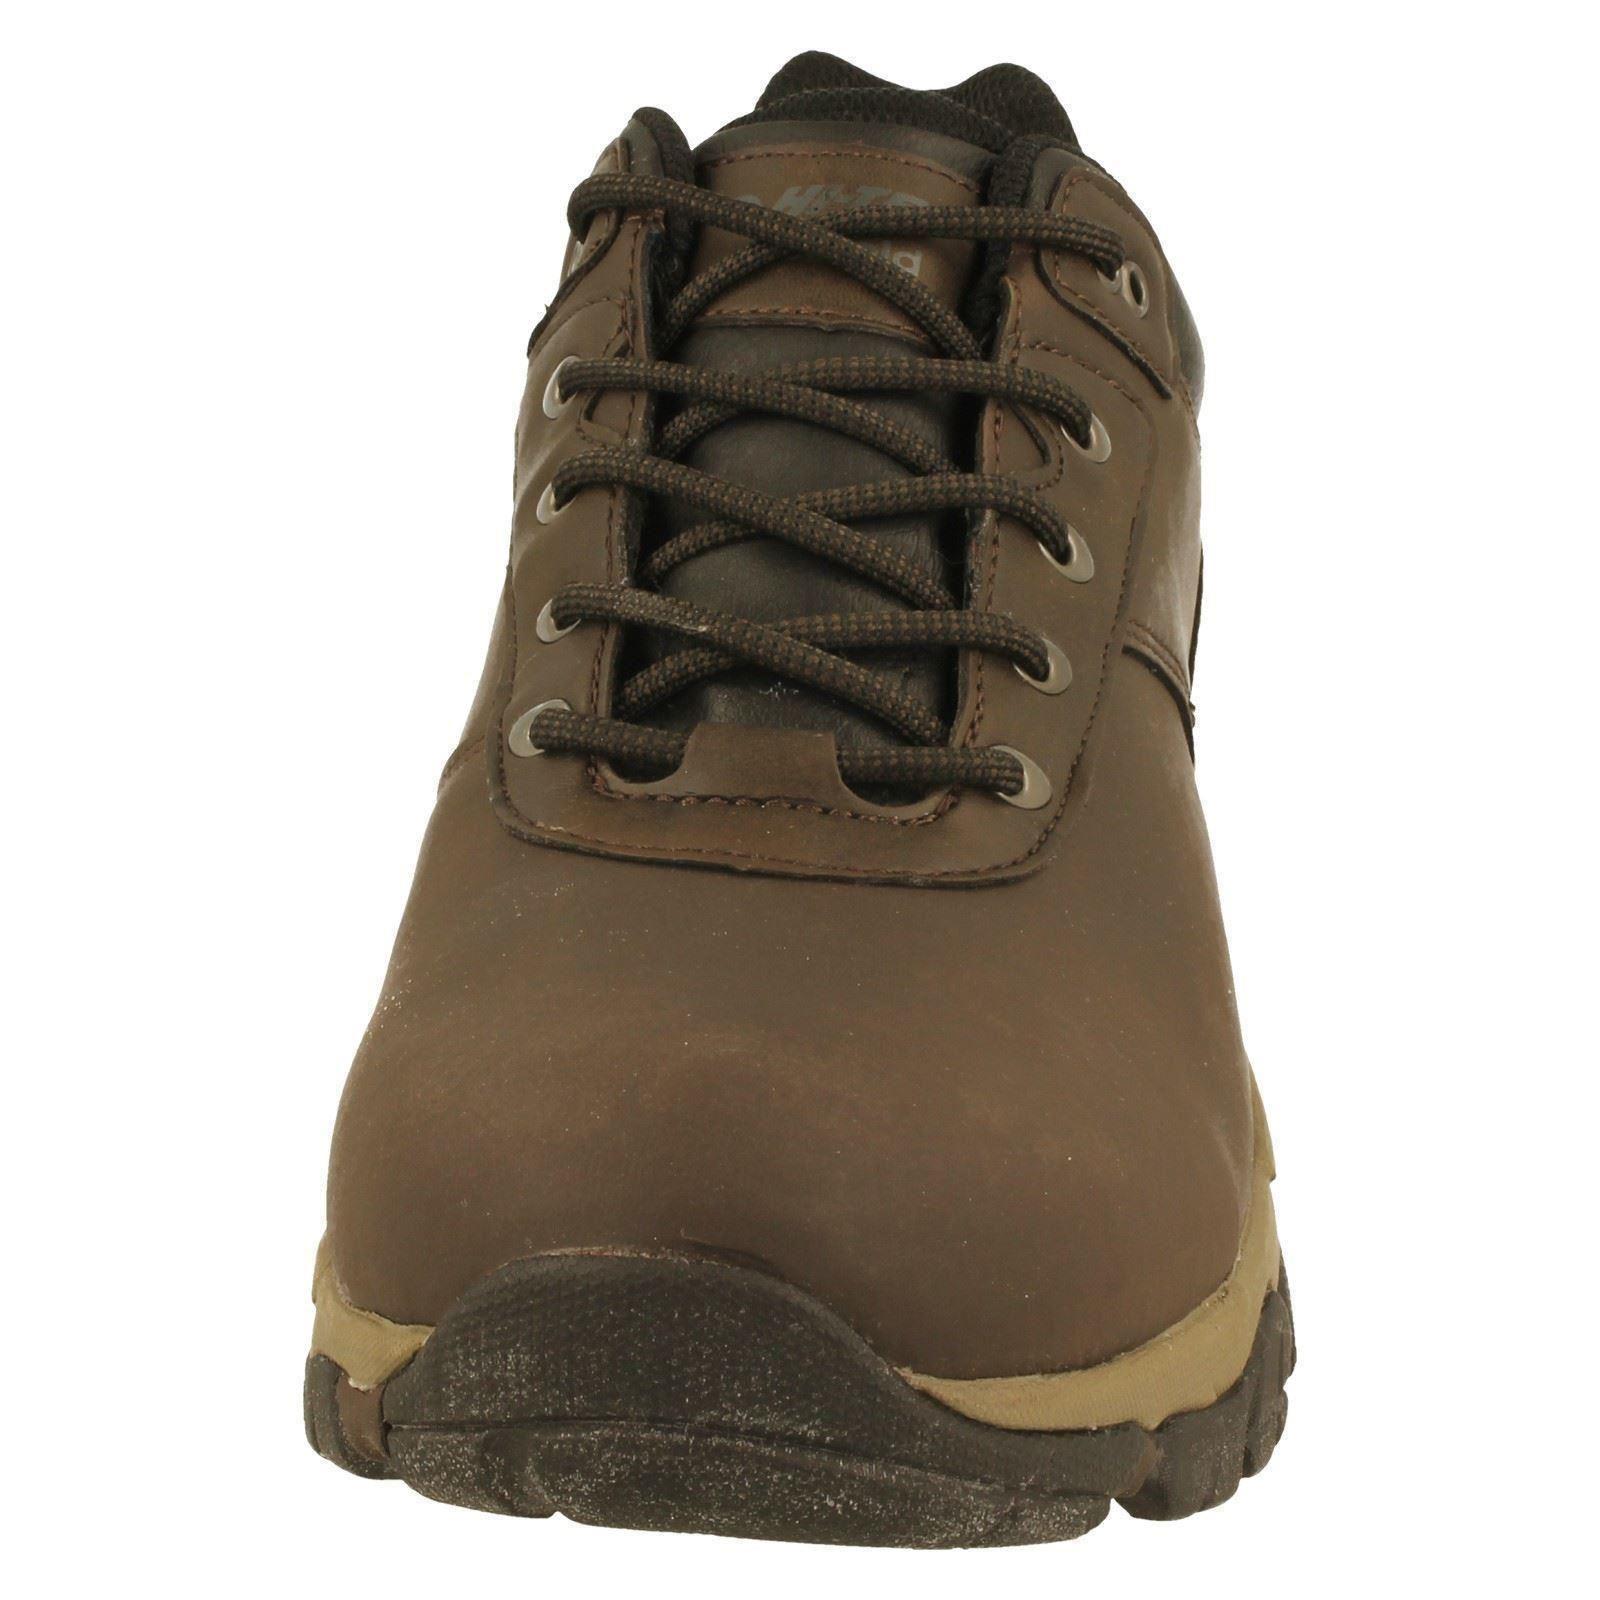 Uomo Hi-Tec Walking V Schuhes The Style Altitude V Walking Niedrig I WP-W e9139c